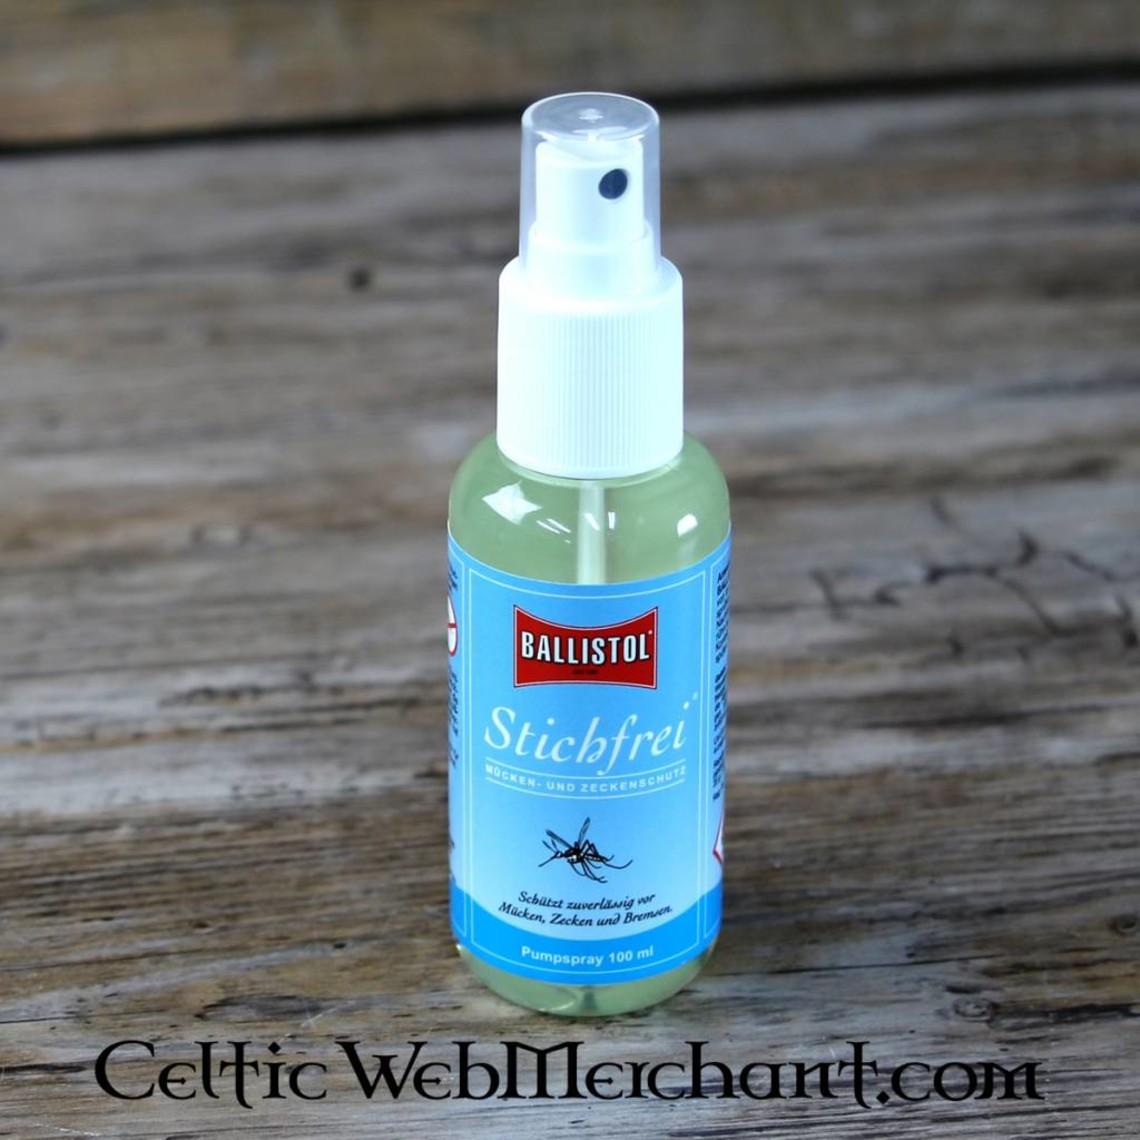 Ballistol Repelente de mosquitos, 100 ml